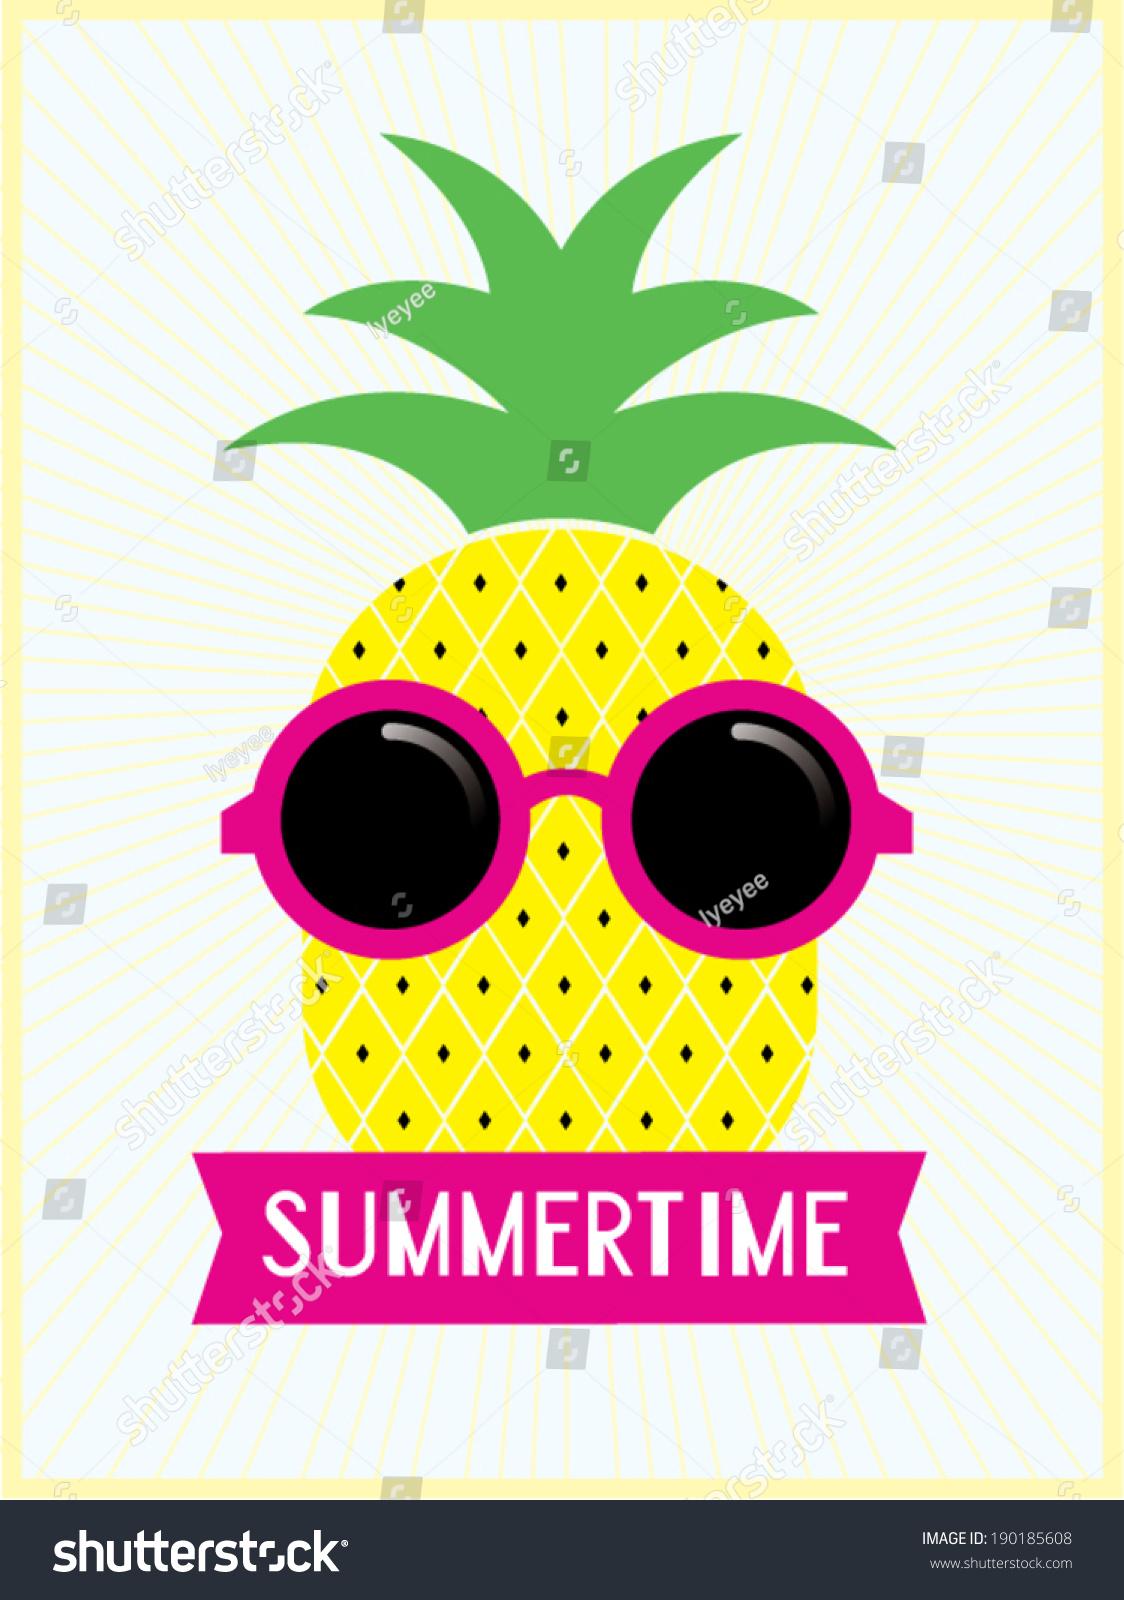 Pineapple Sunnies Summertime Template Vectorillustration ...